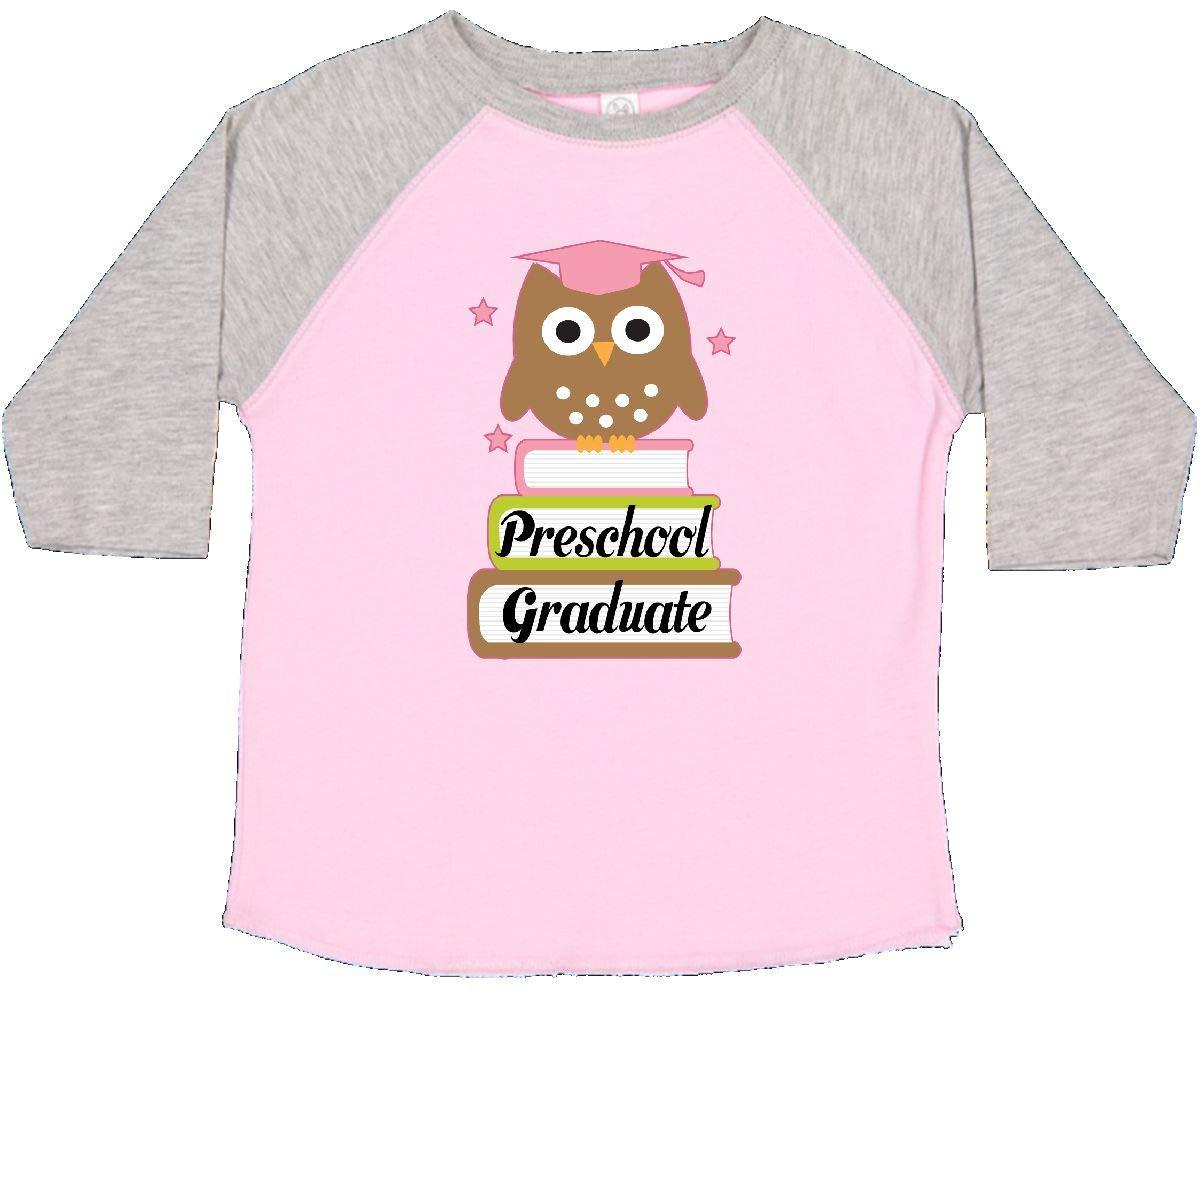 inktastic Preschool Graduate Cute Owl Toddler T-Shirt